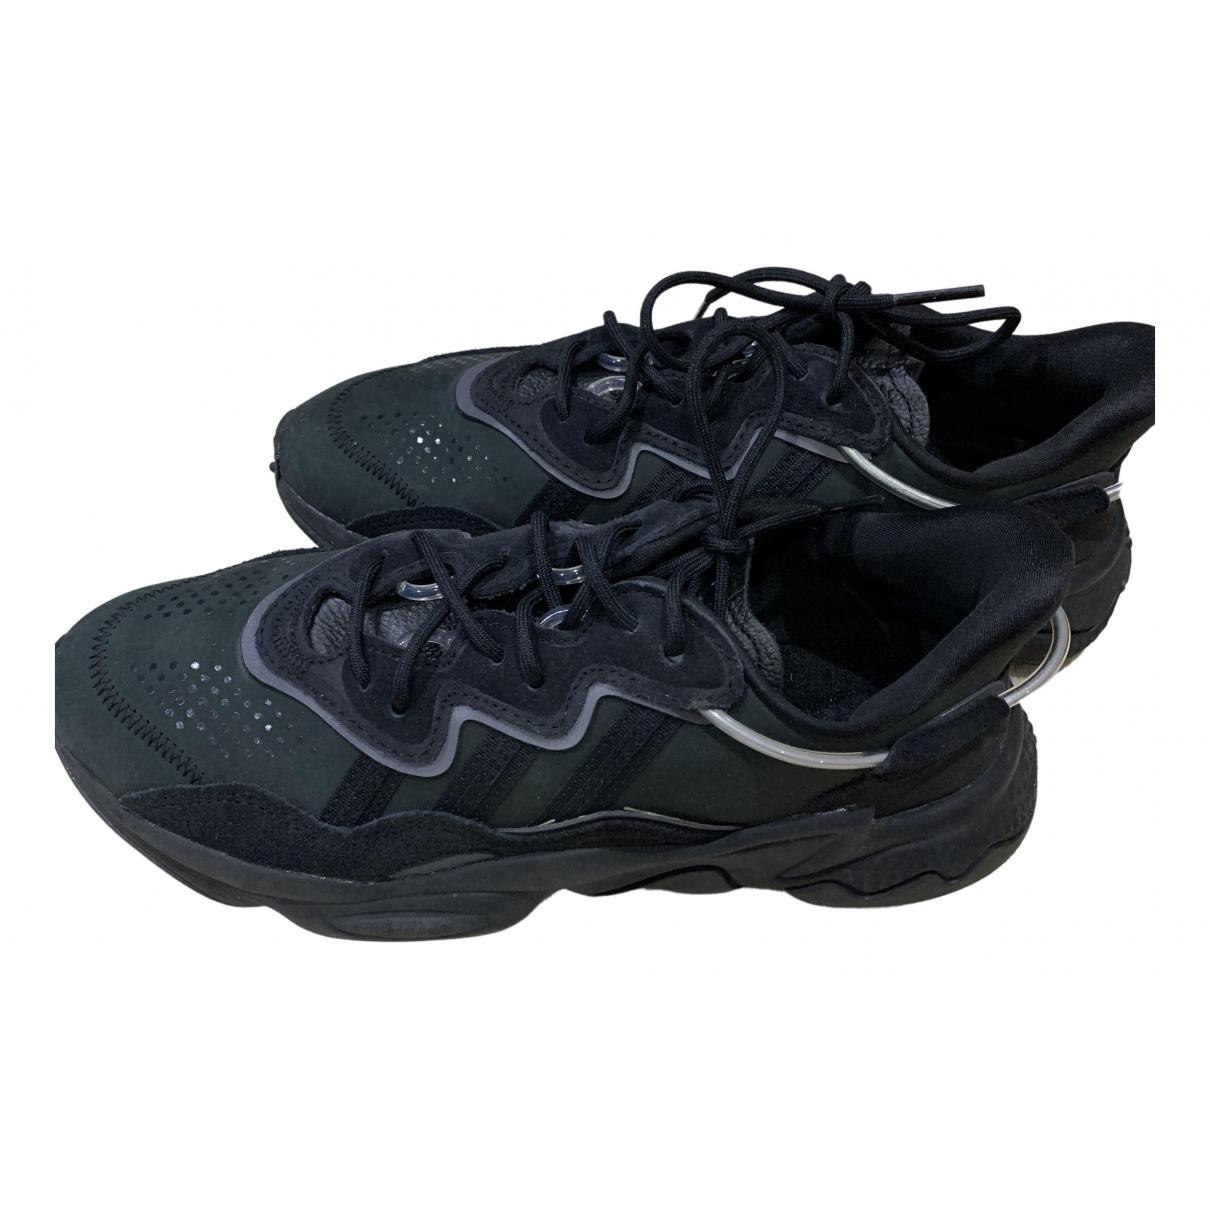 Adidas - Baskets Ozweego pour homme en cuir - noir